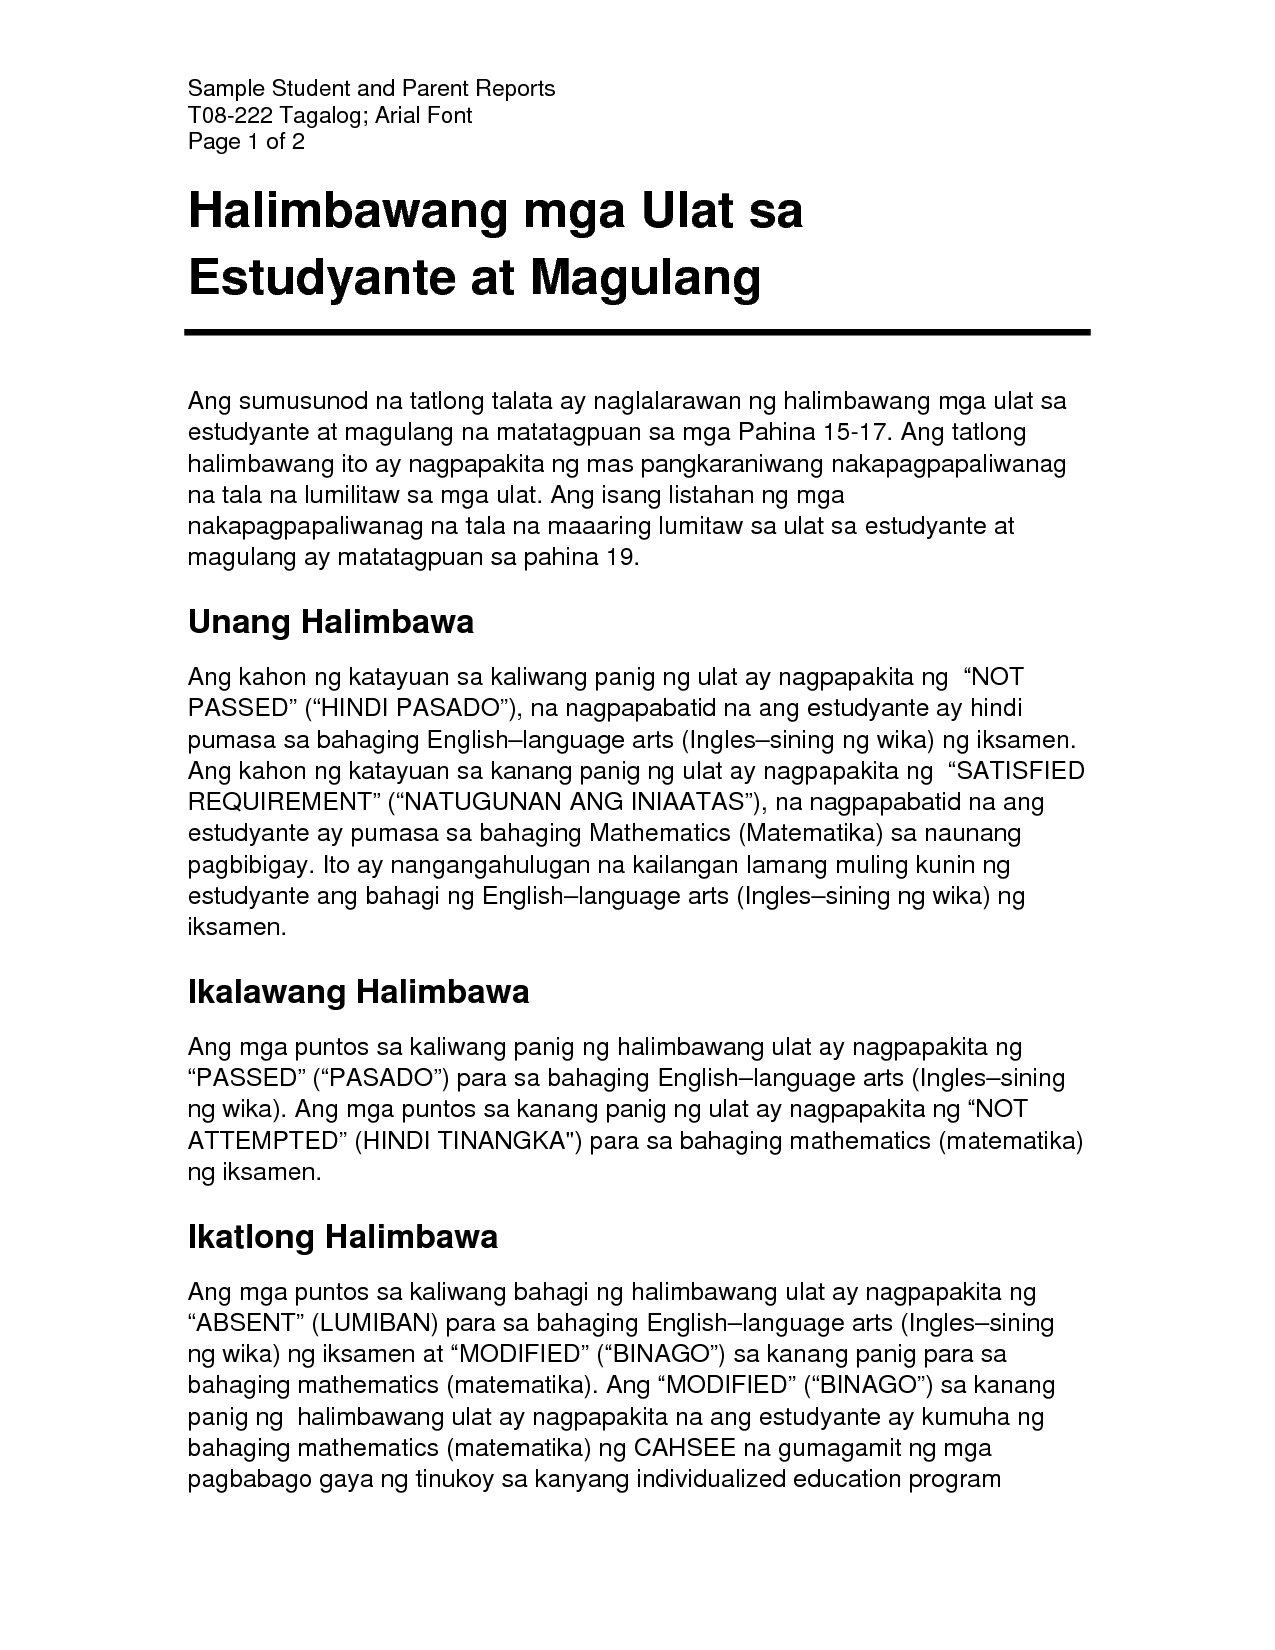 Essays harvard referencing system